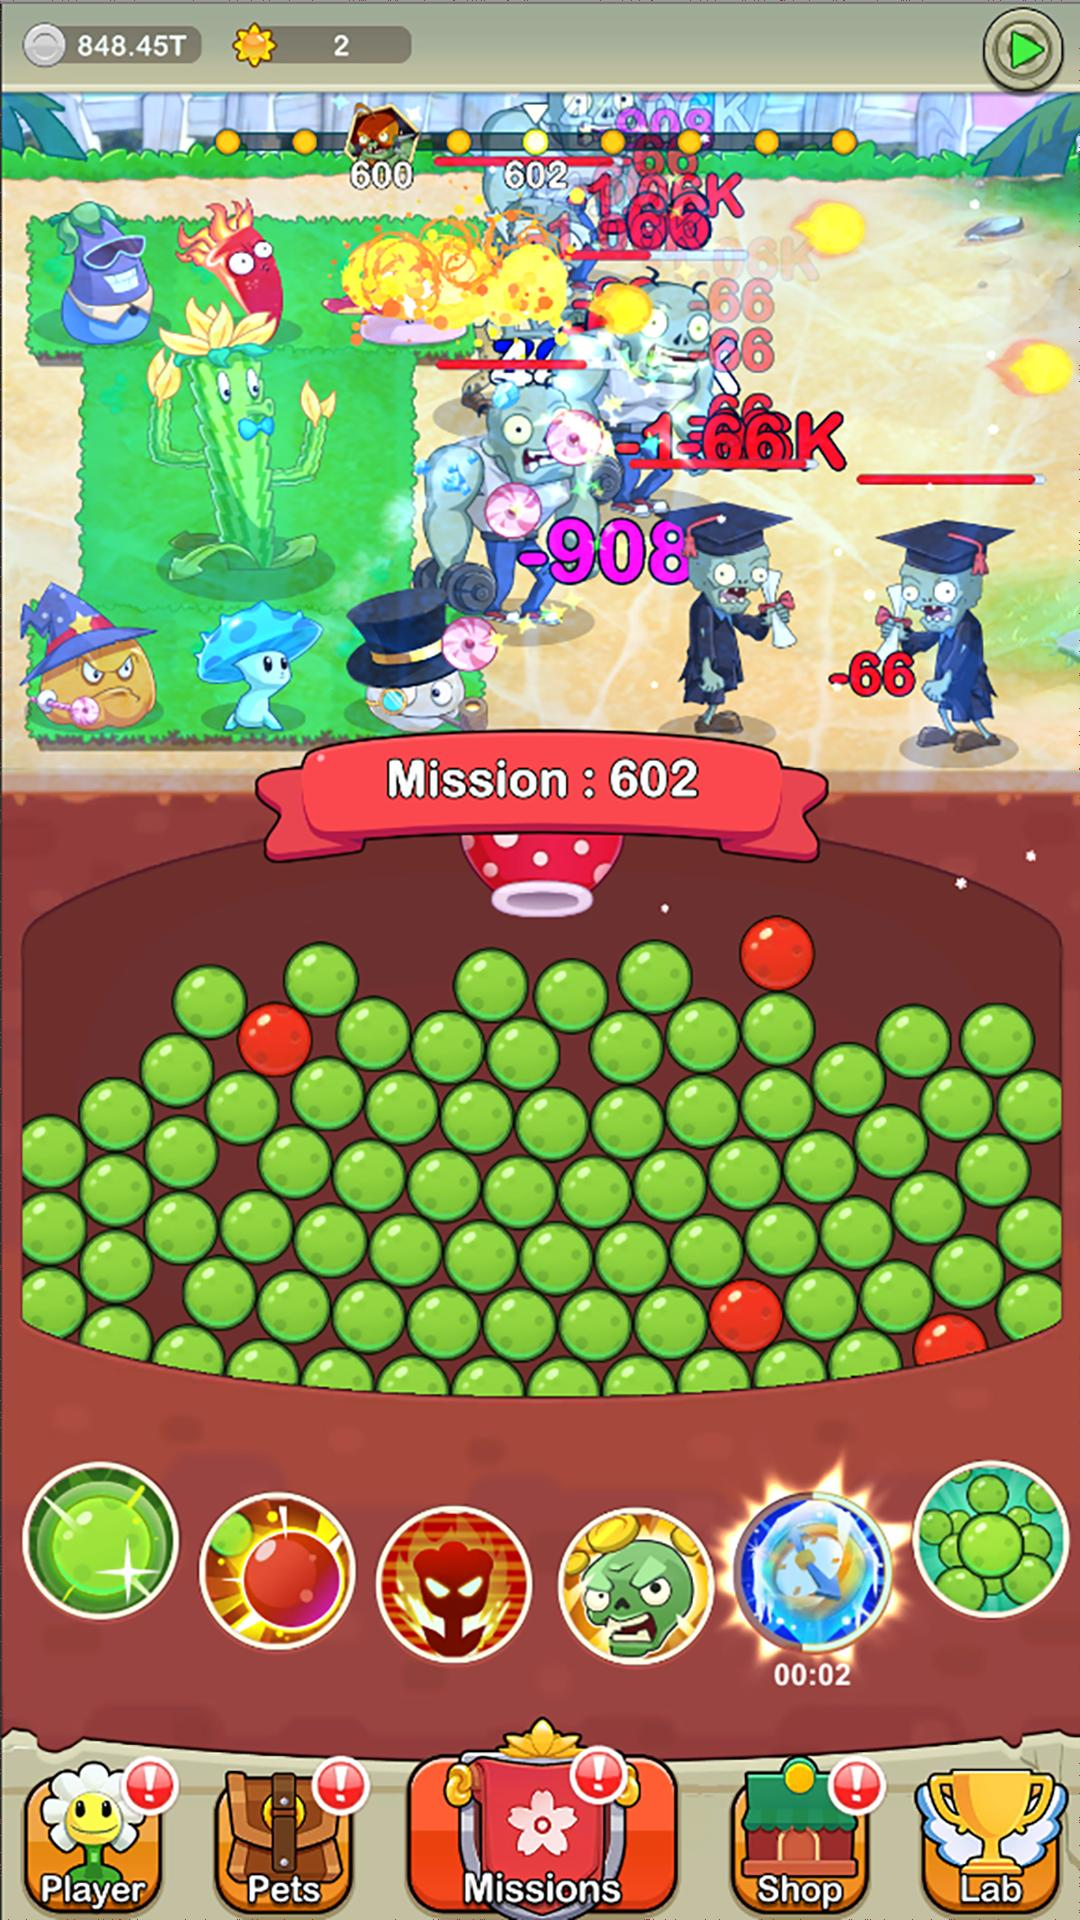 Save Garden Zombie Attack & Idle RPG 1.3.5 Screenshot 1